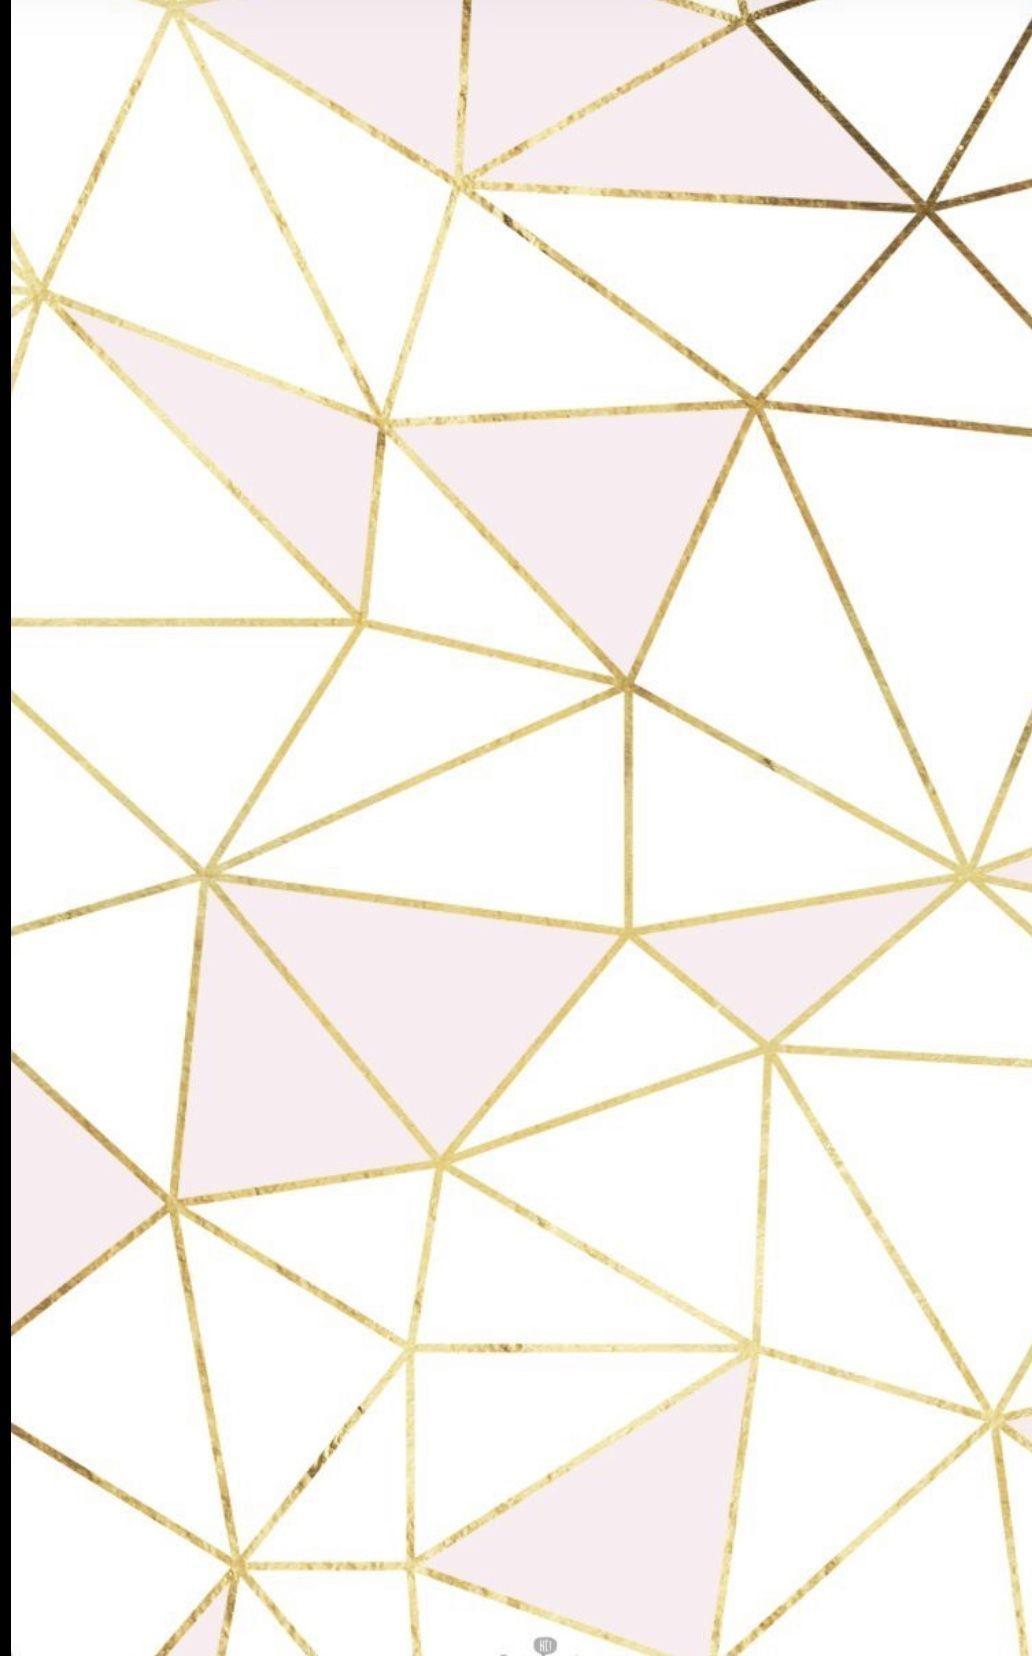 Samsung Wallpaper Girly Hintergrundbild Tapete Fondecraniphonemarbre Samsung Wallpa In 2020 Geometric Wallpaper Iphone Gold Wallpaper Iphone Pink And Gold Wallpaper